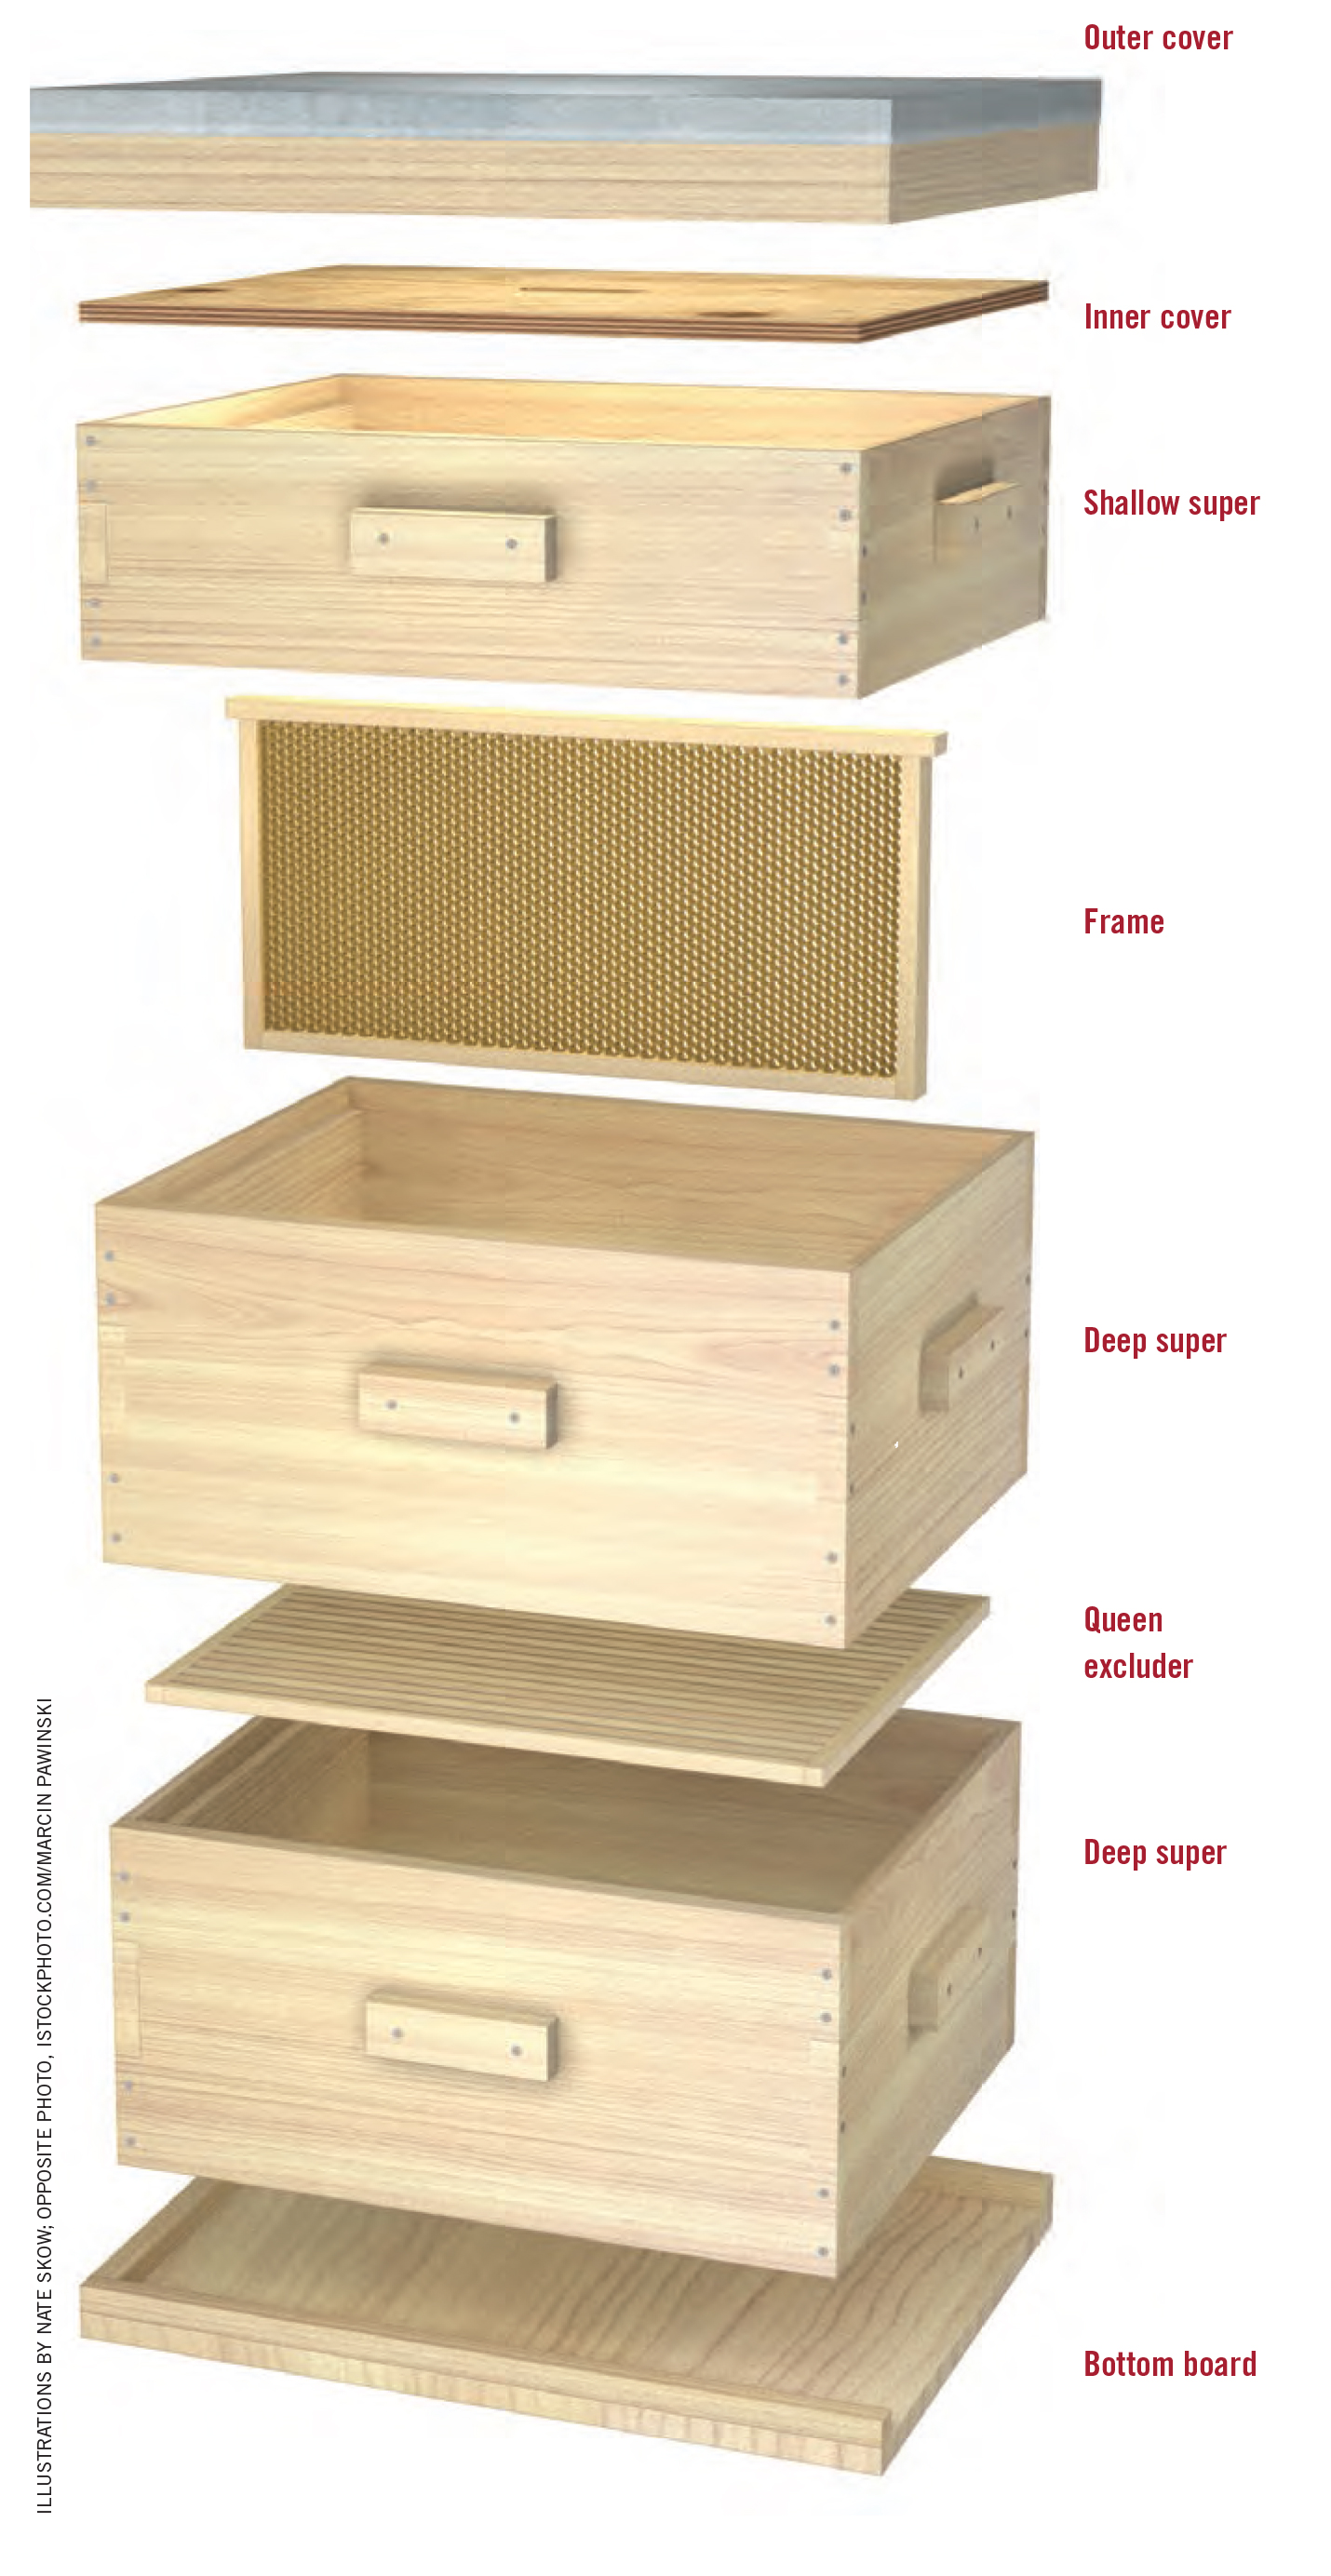 Anatomy of a beehive Keeping Backyard Bees